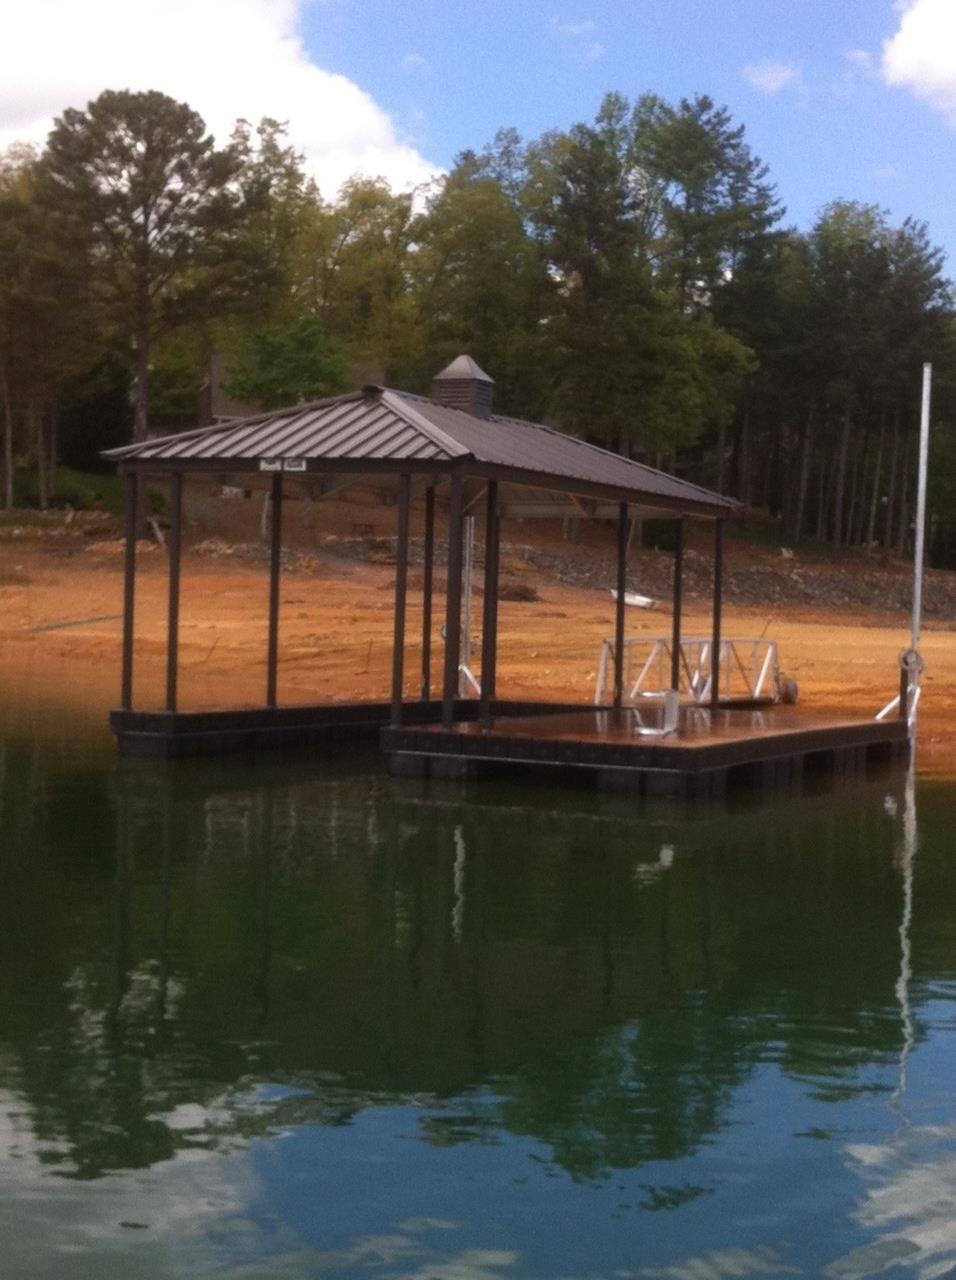 NGBL North Georgia Boat Lift - Marine Construction Co. Installs Wahoo CAT 3 Aluminum Floating Boat Dock